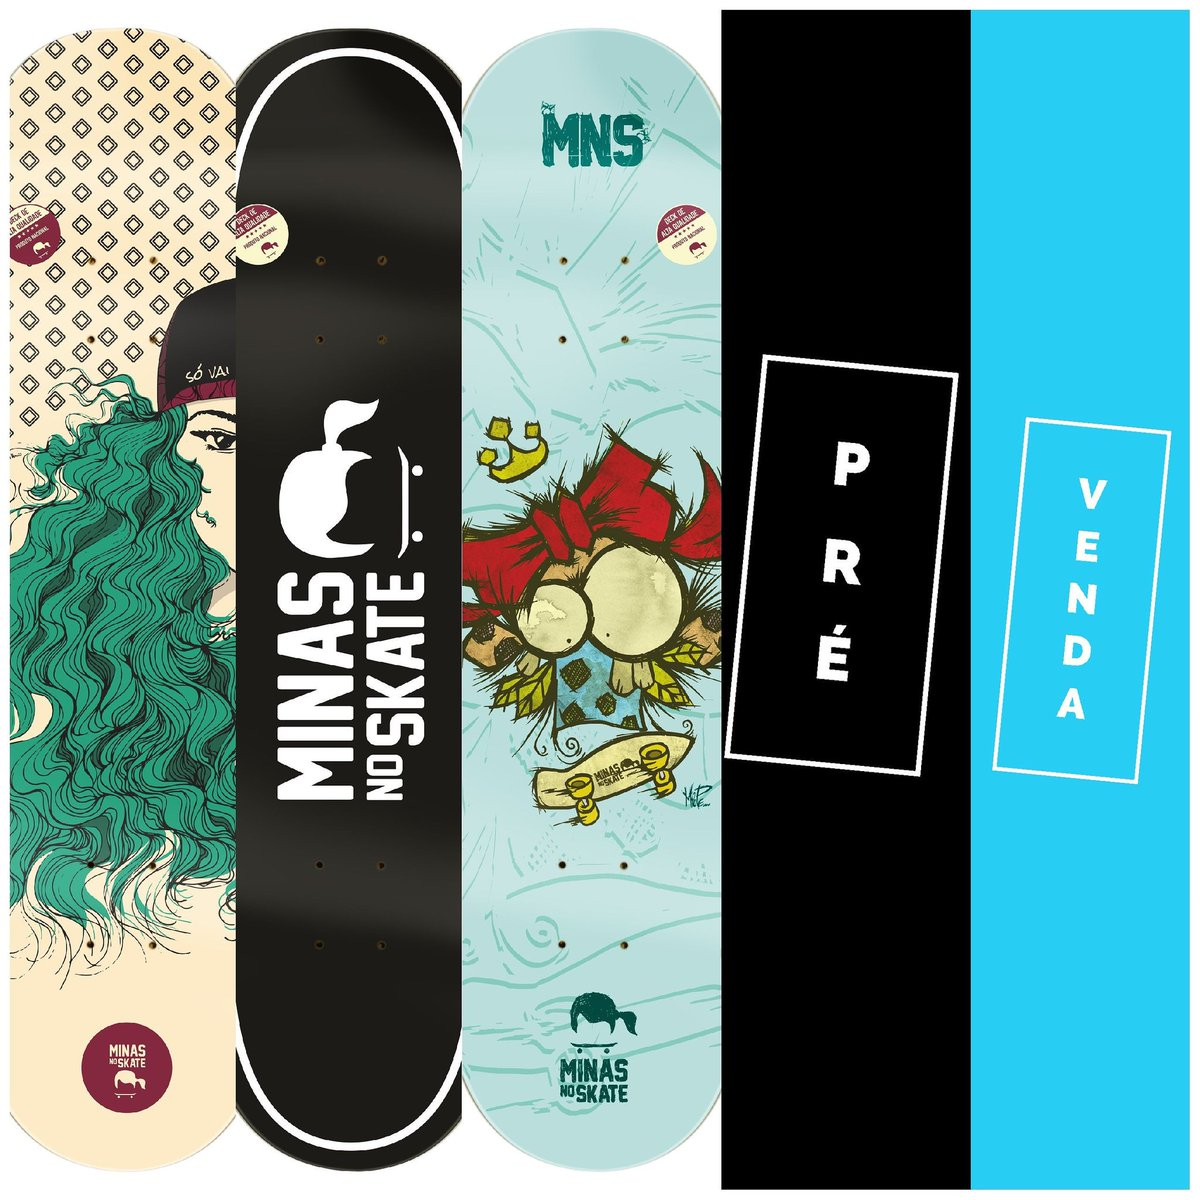 458c0cefb Minas no Skate (@MinasNoSkate)   Twitter